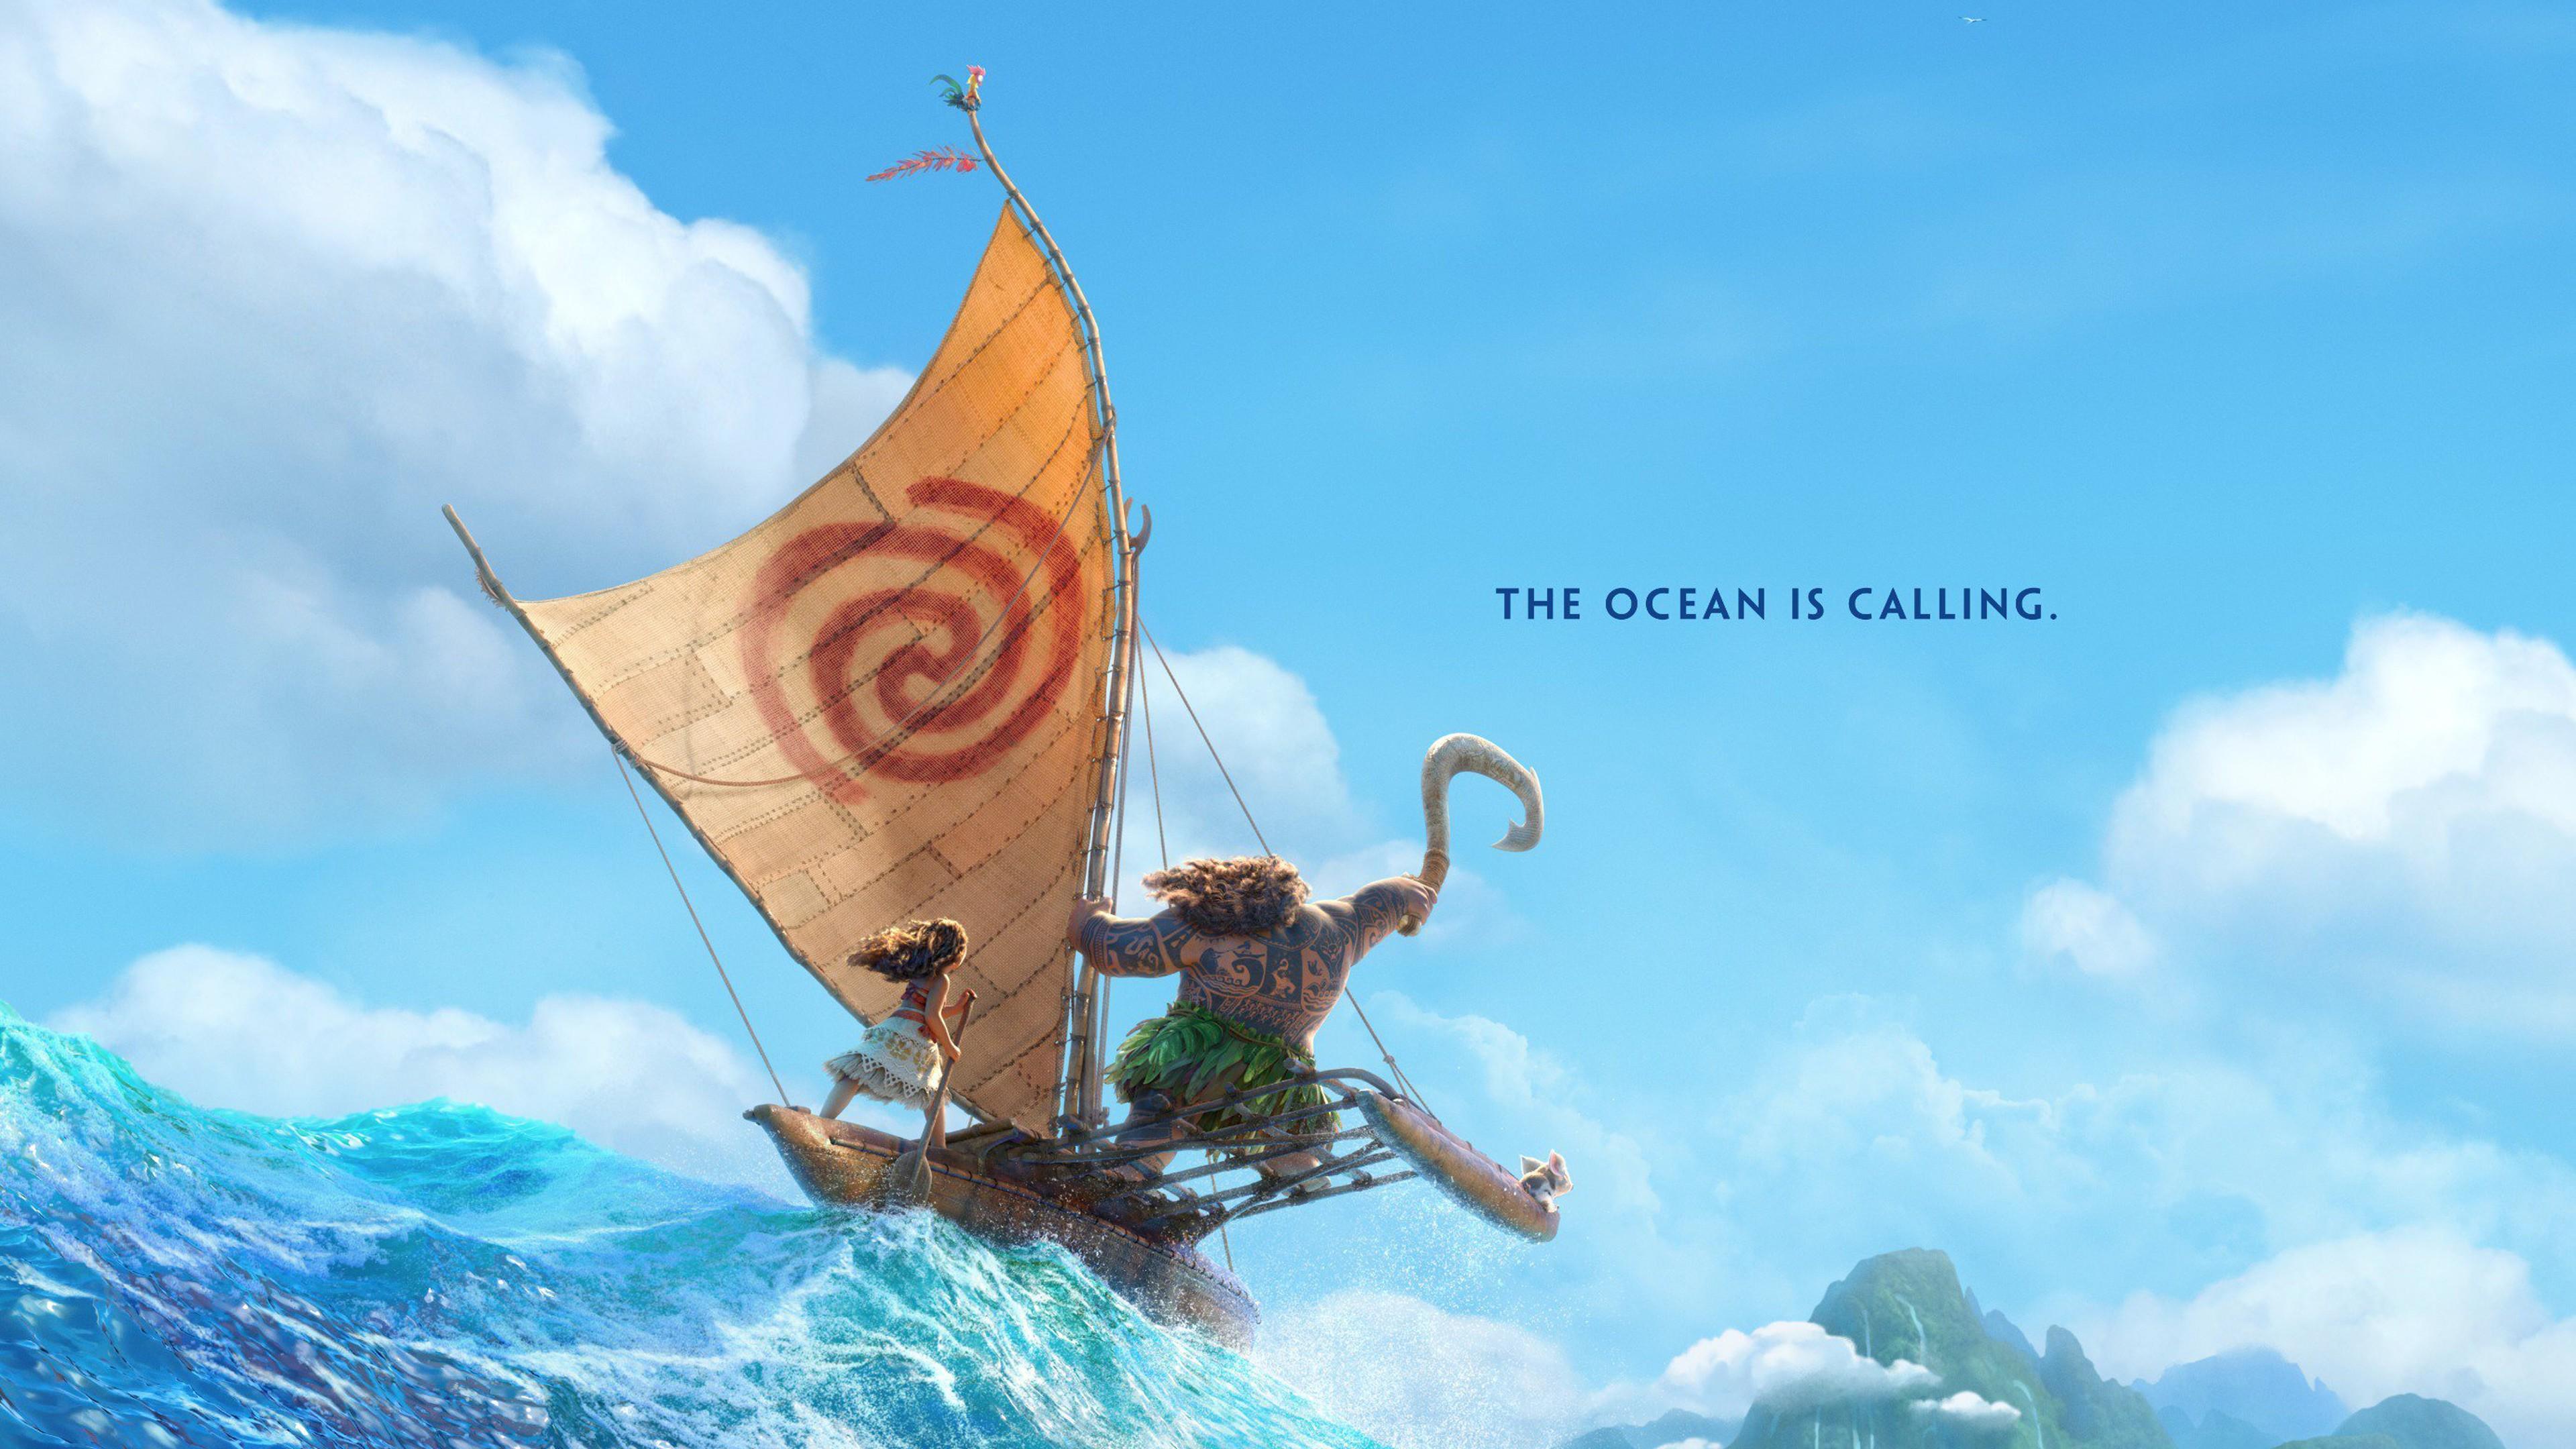 Wallpaper Ship Drowning Hd Creative Graphics 8497: Wallpaper Moana, Maui, Ocean, Best Animation Movies Of